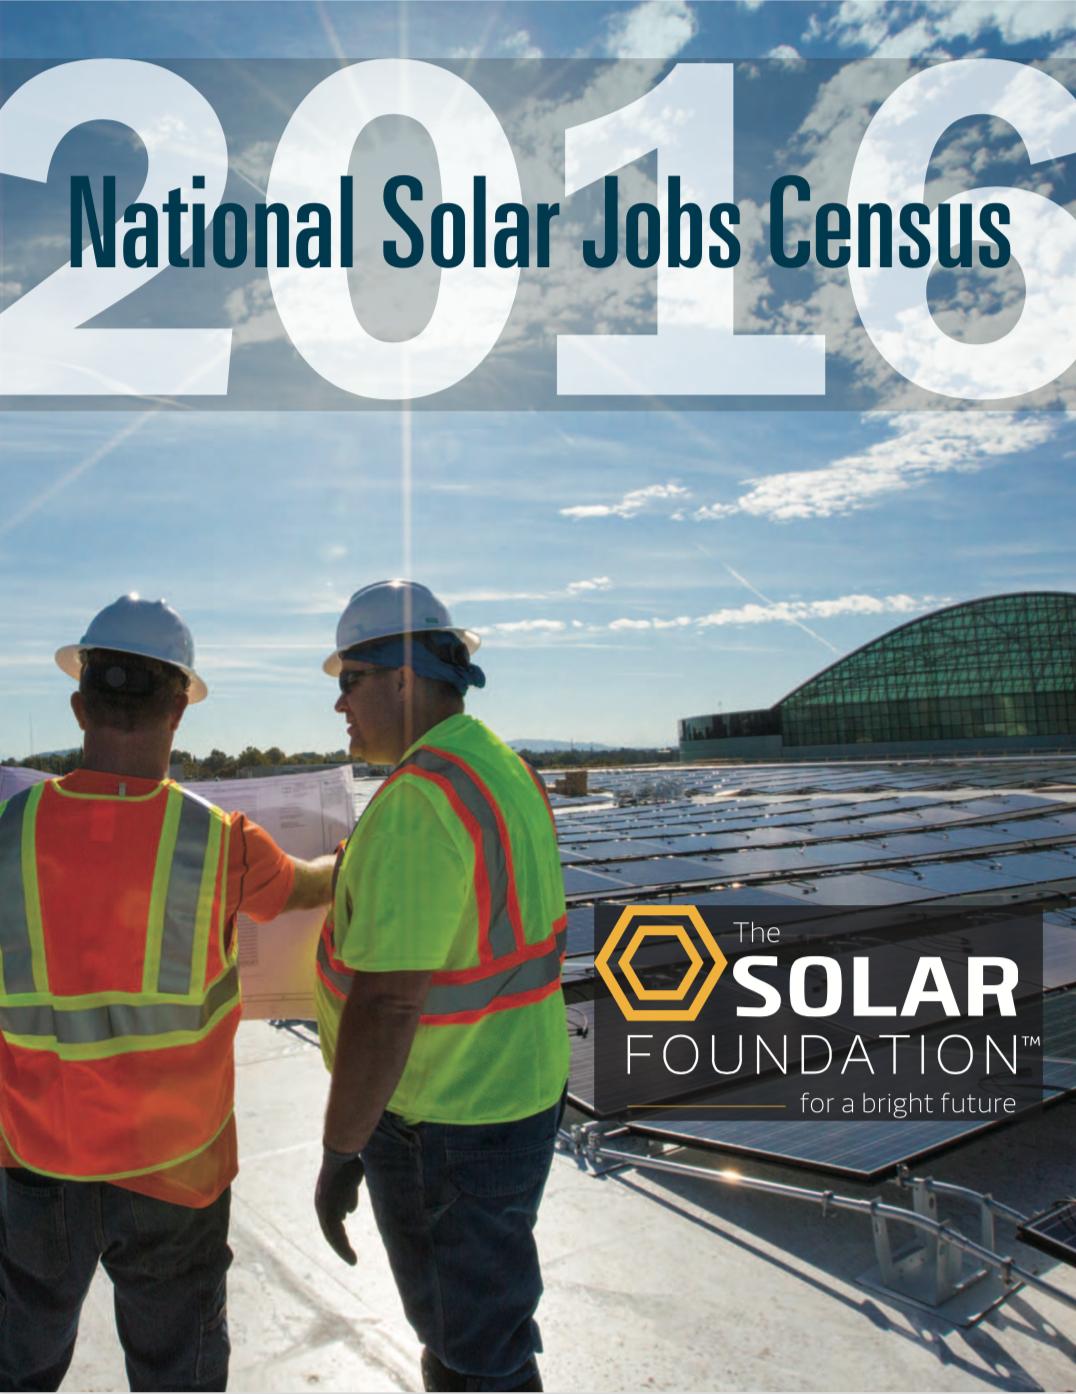 National Solar Jobs Census 2016